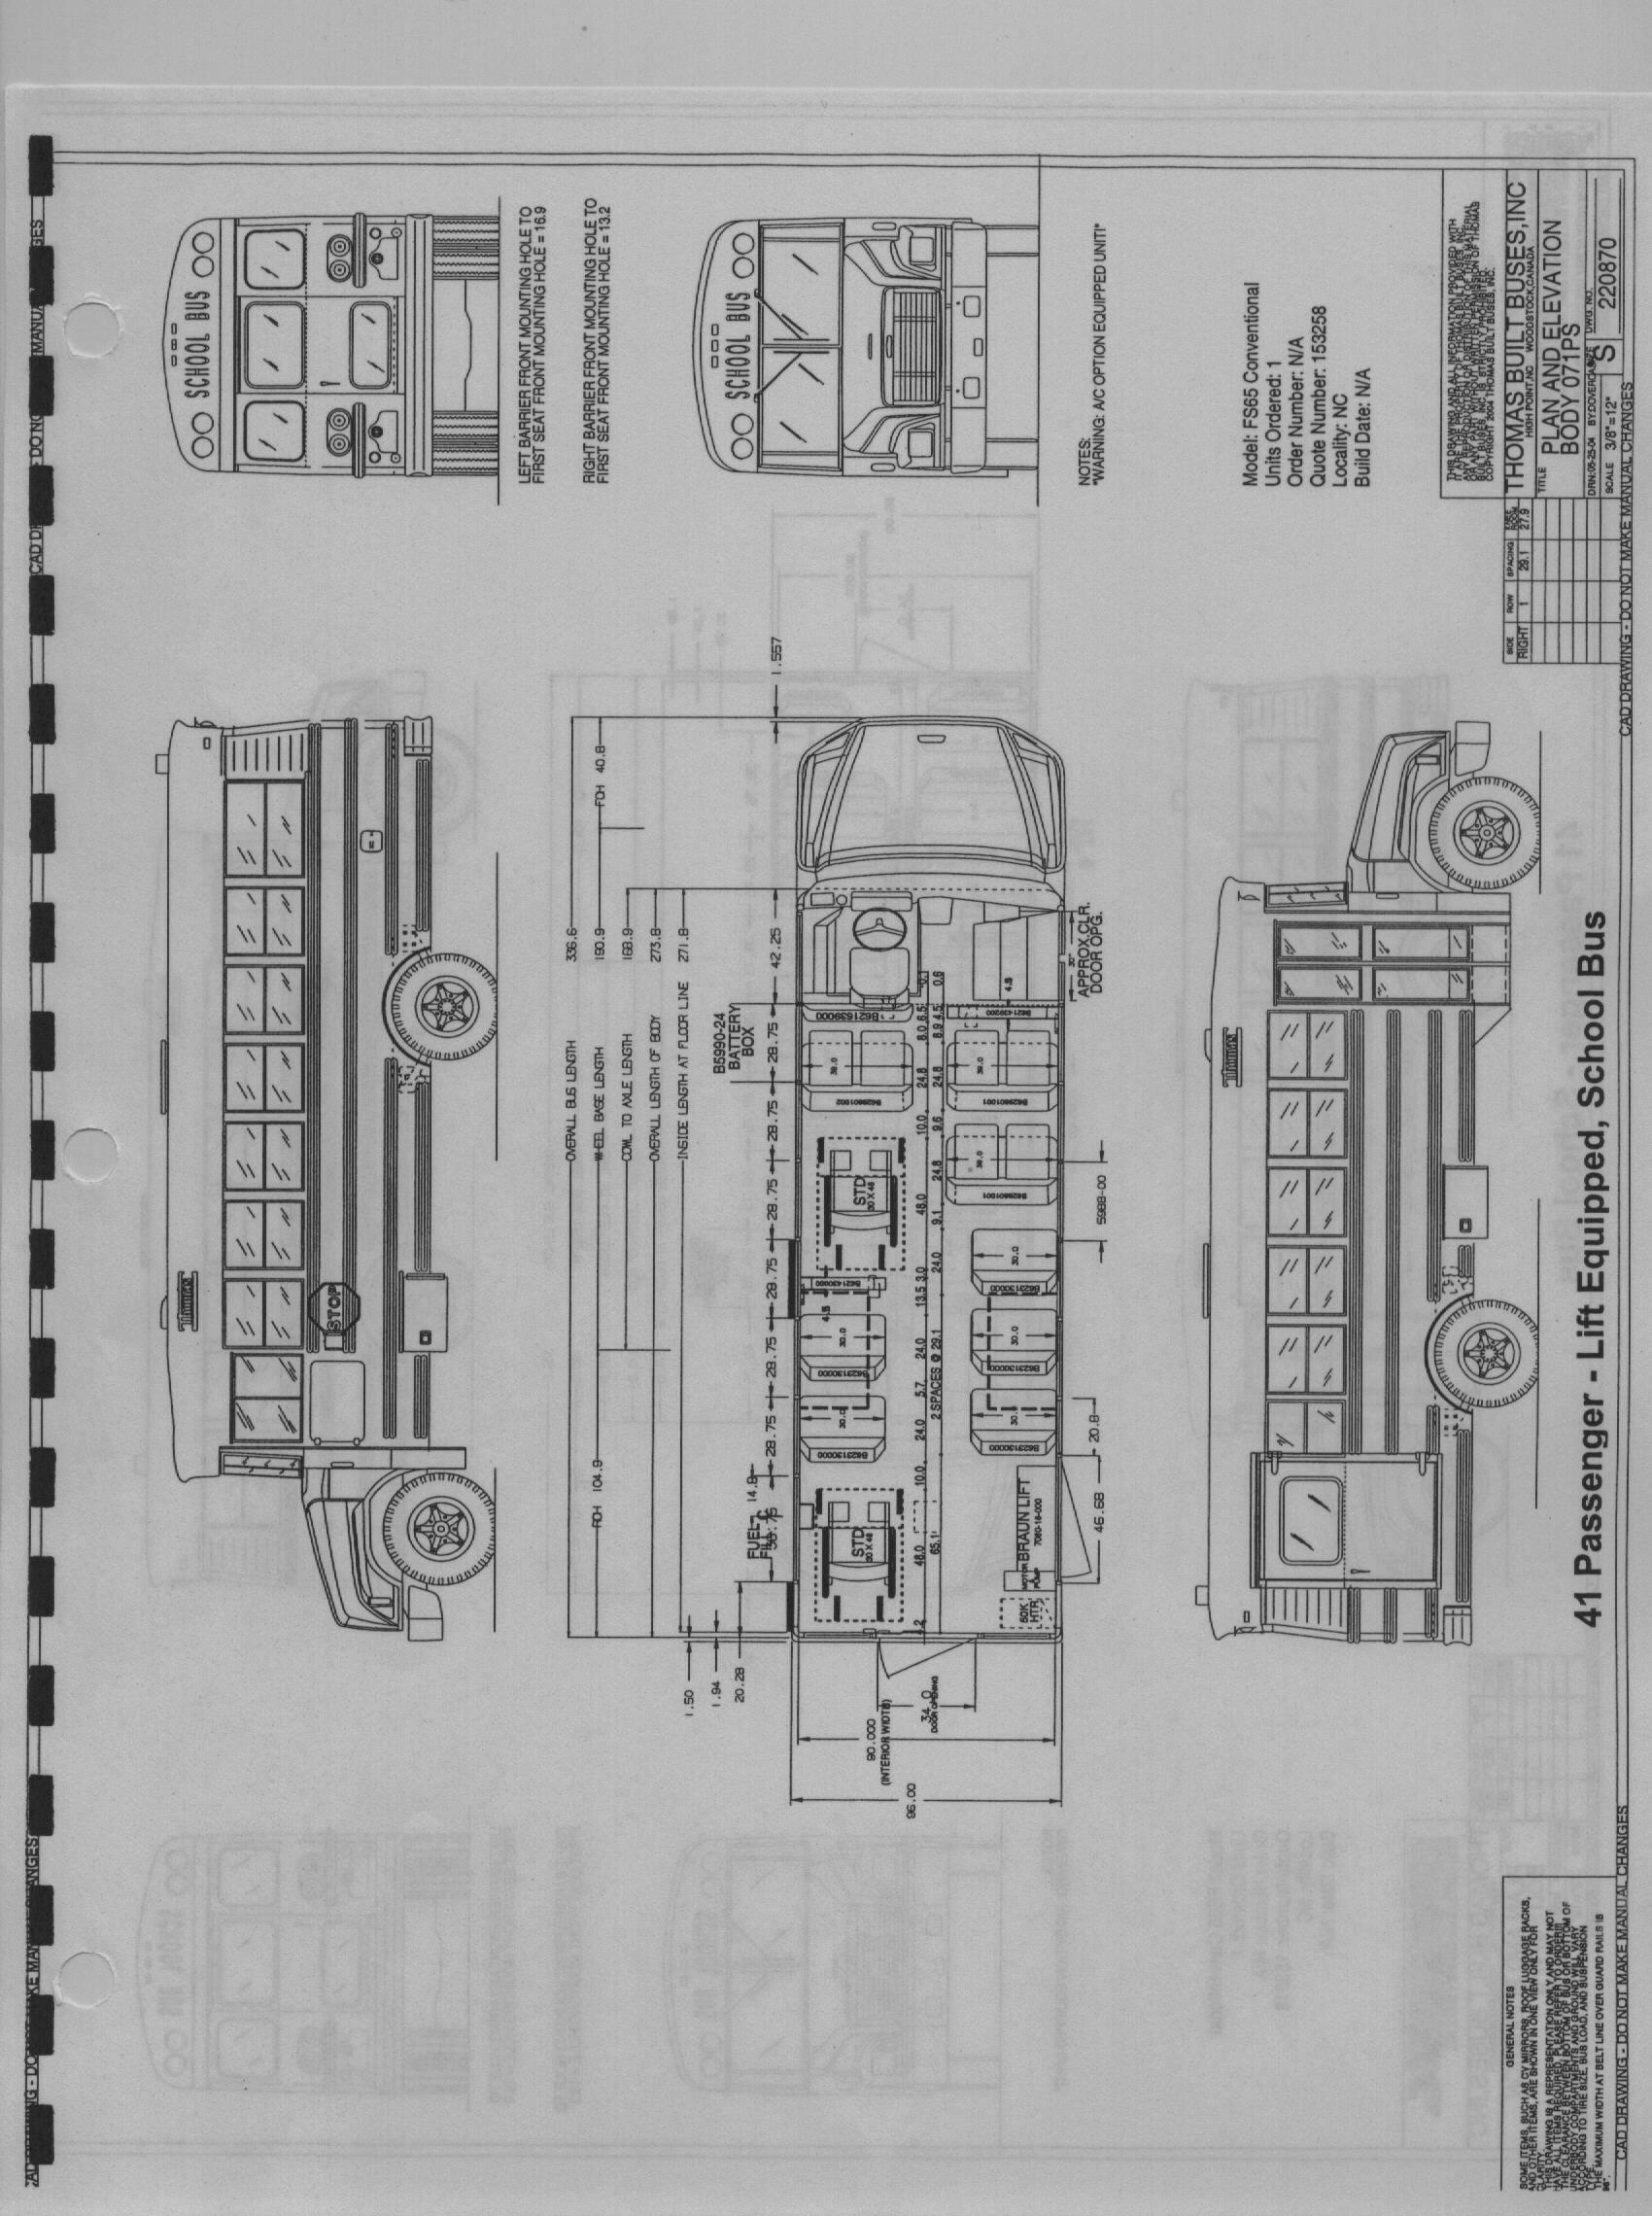 thomas school bus wiring diagrams